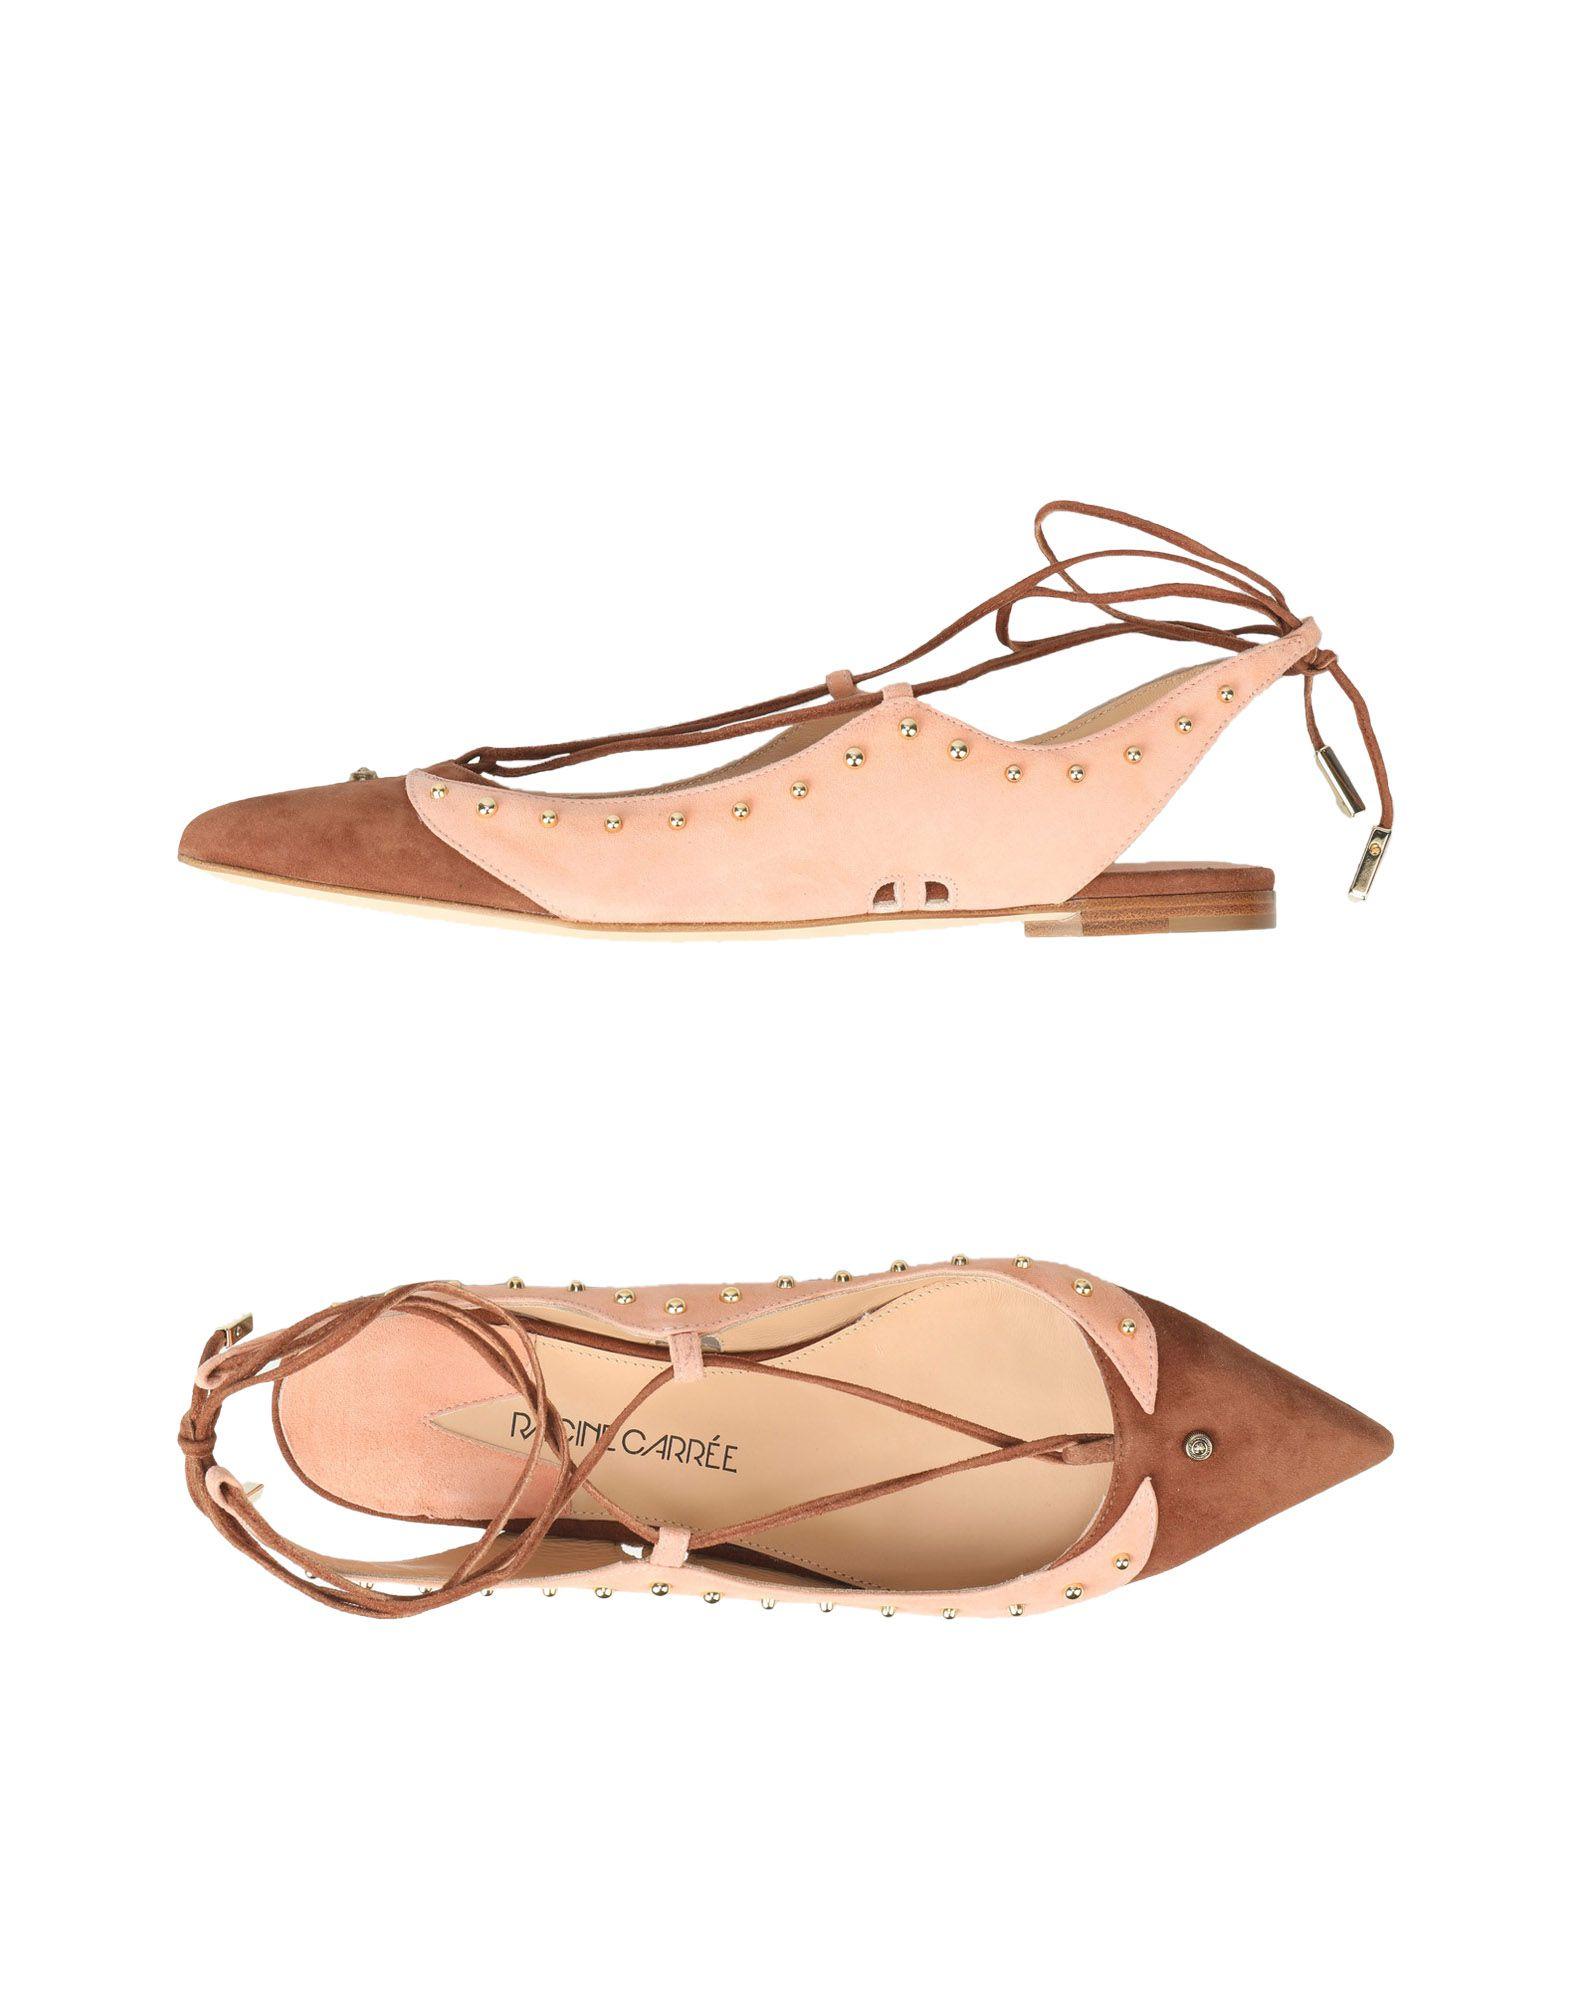 Racine Carrée Ballerinas Damen  11350764AM Neue Schuhe